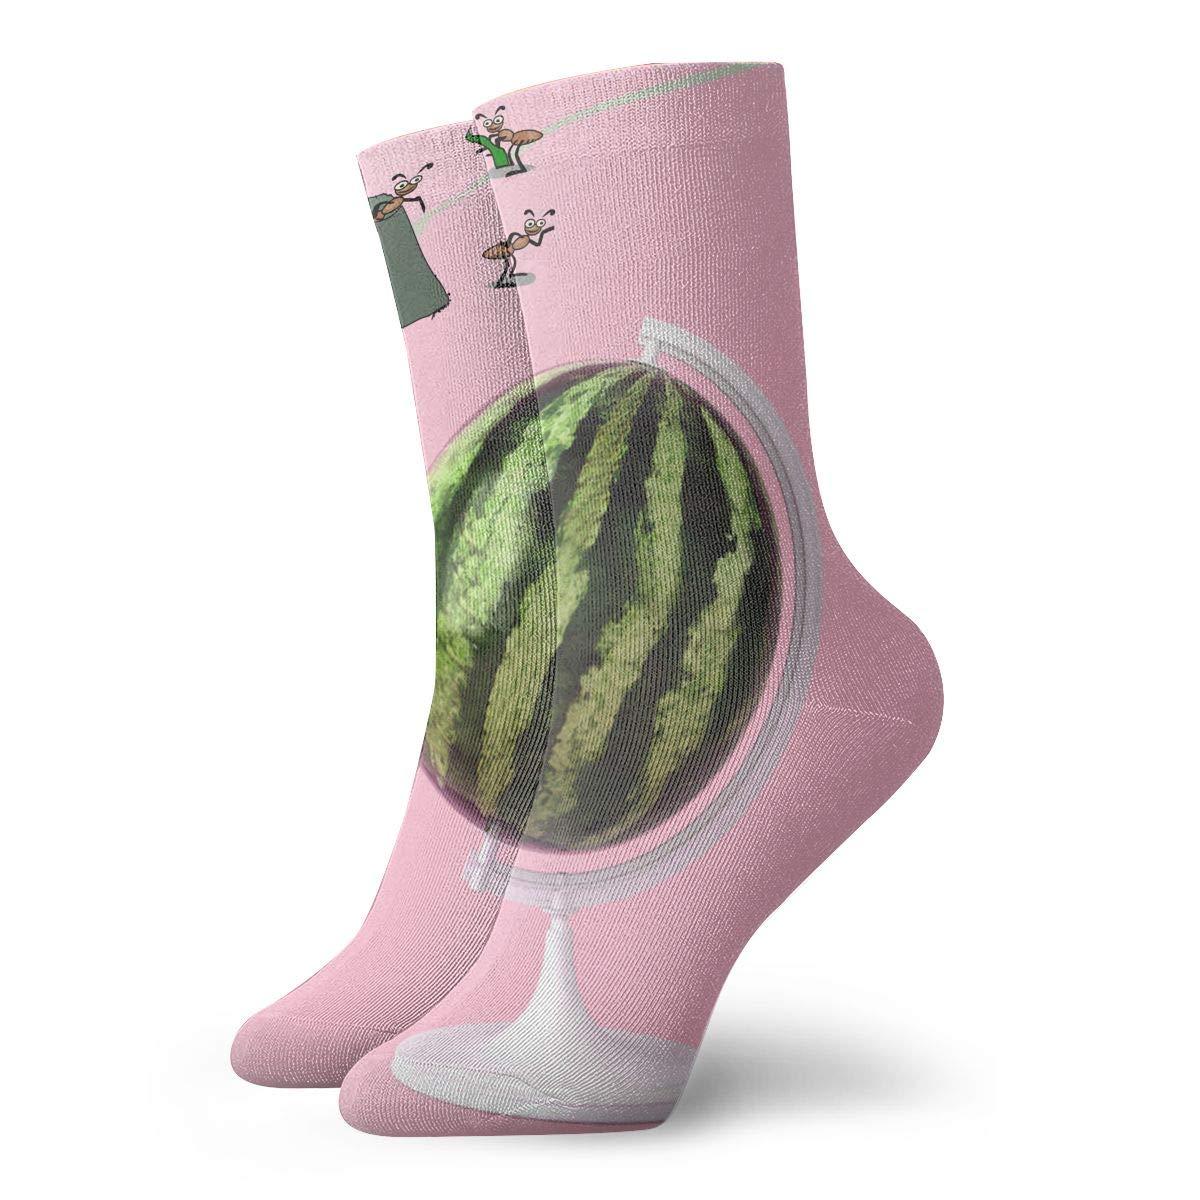 Ant Cartoon Funny Mens Fashion Dress Socks Short Socks Leisure Travel 11.8 Inch